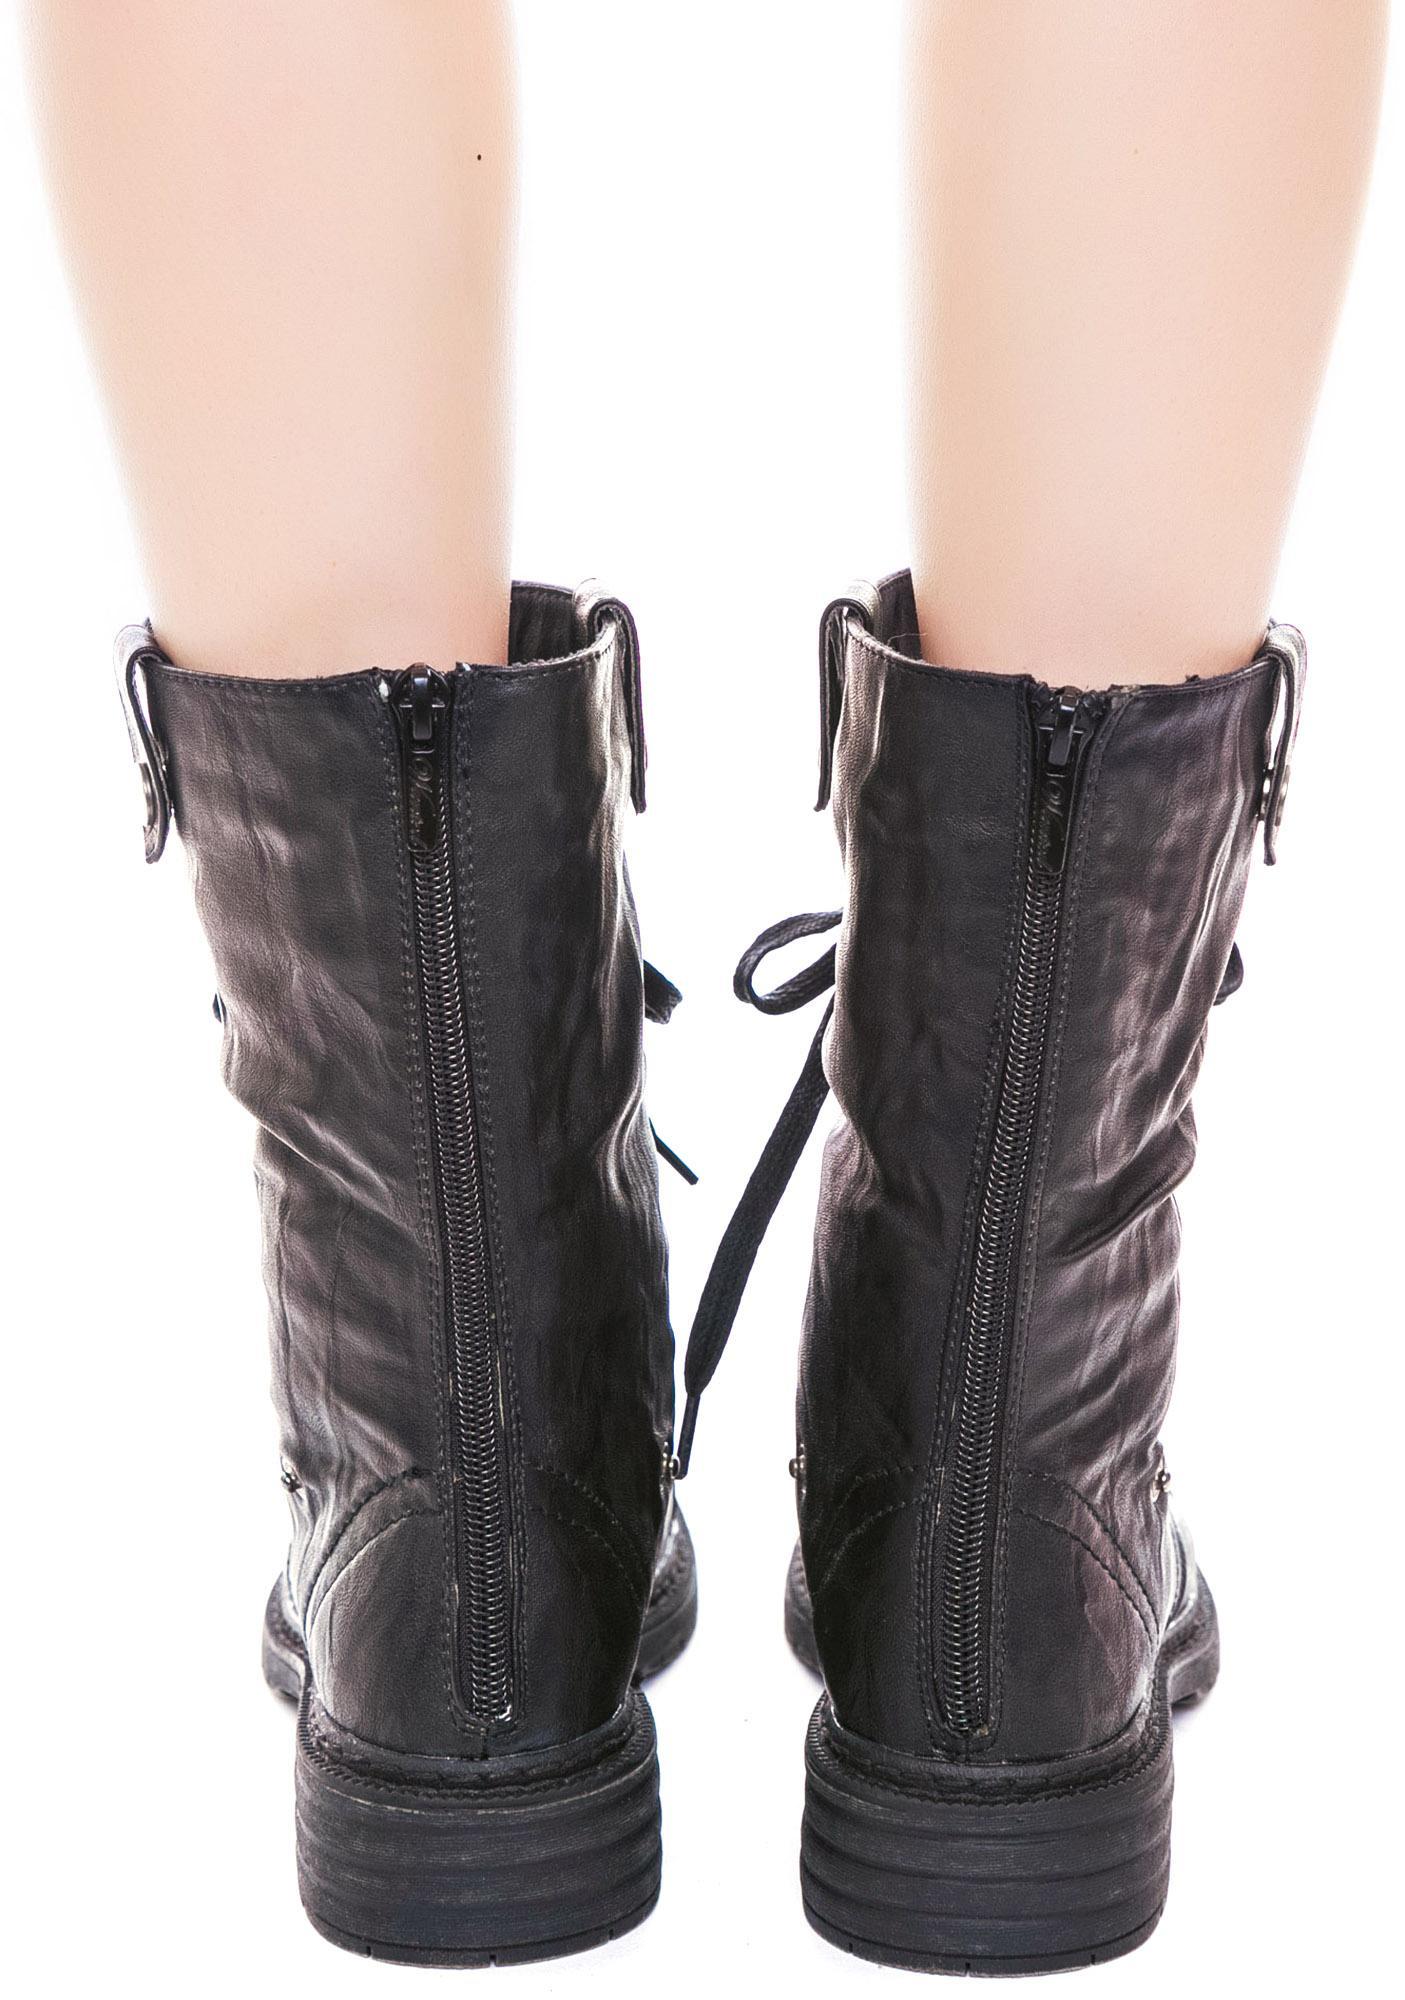 Crowley Booties